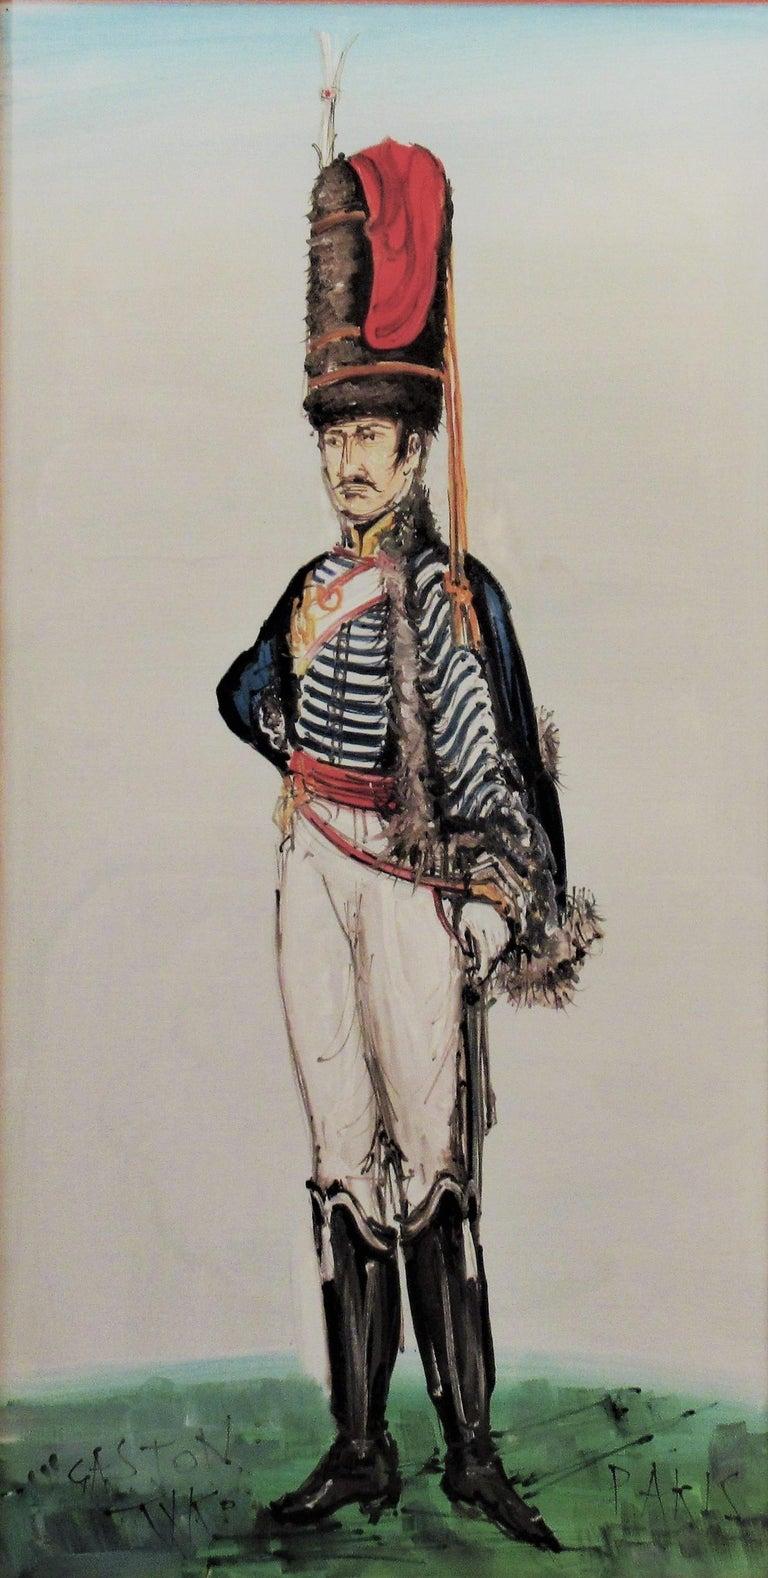 Hussard du Premier Empire, Paris - Painting by Gaston Tyco